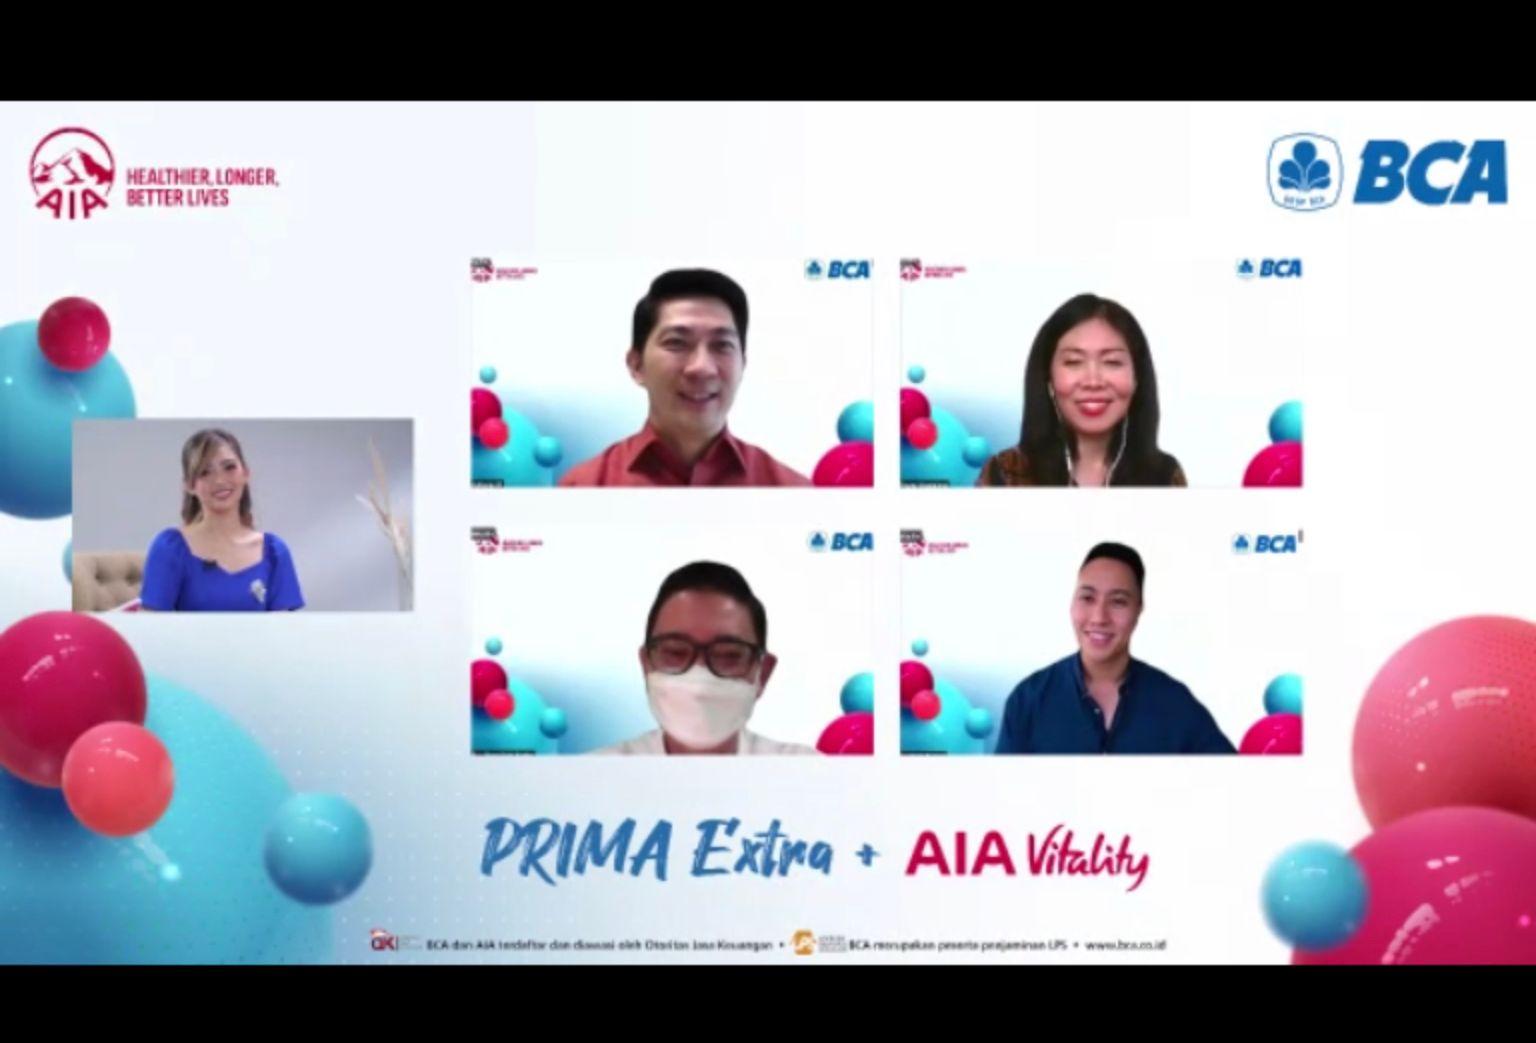 Gandeng BCA, AIA Upgrade AIA Vitality untuk Tangani Penyakit Serius